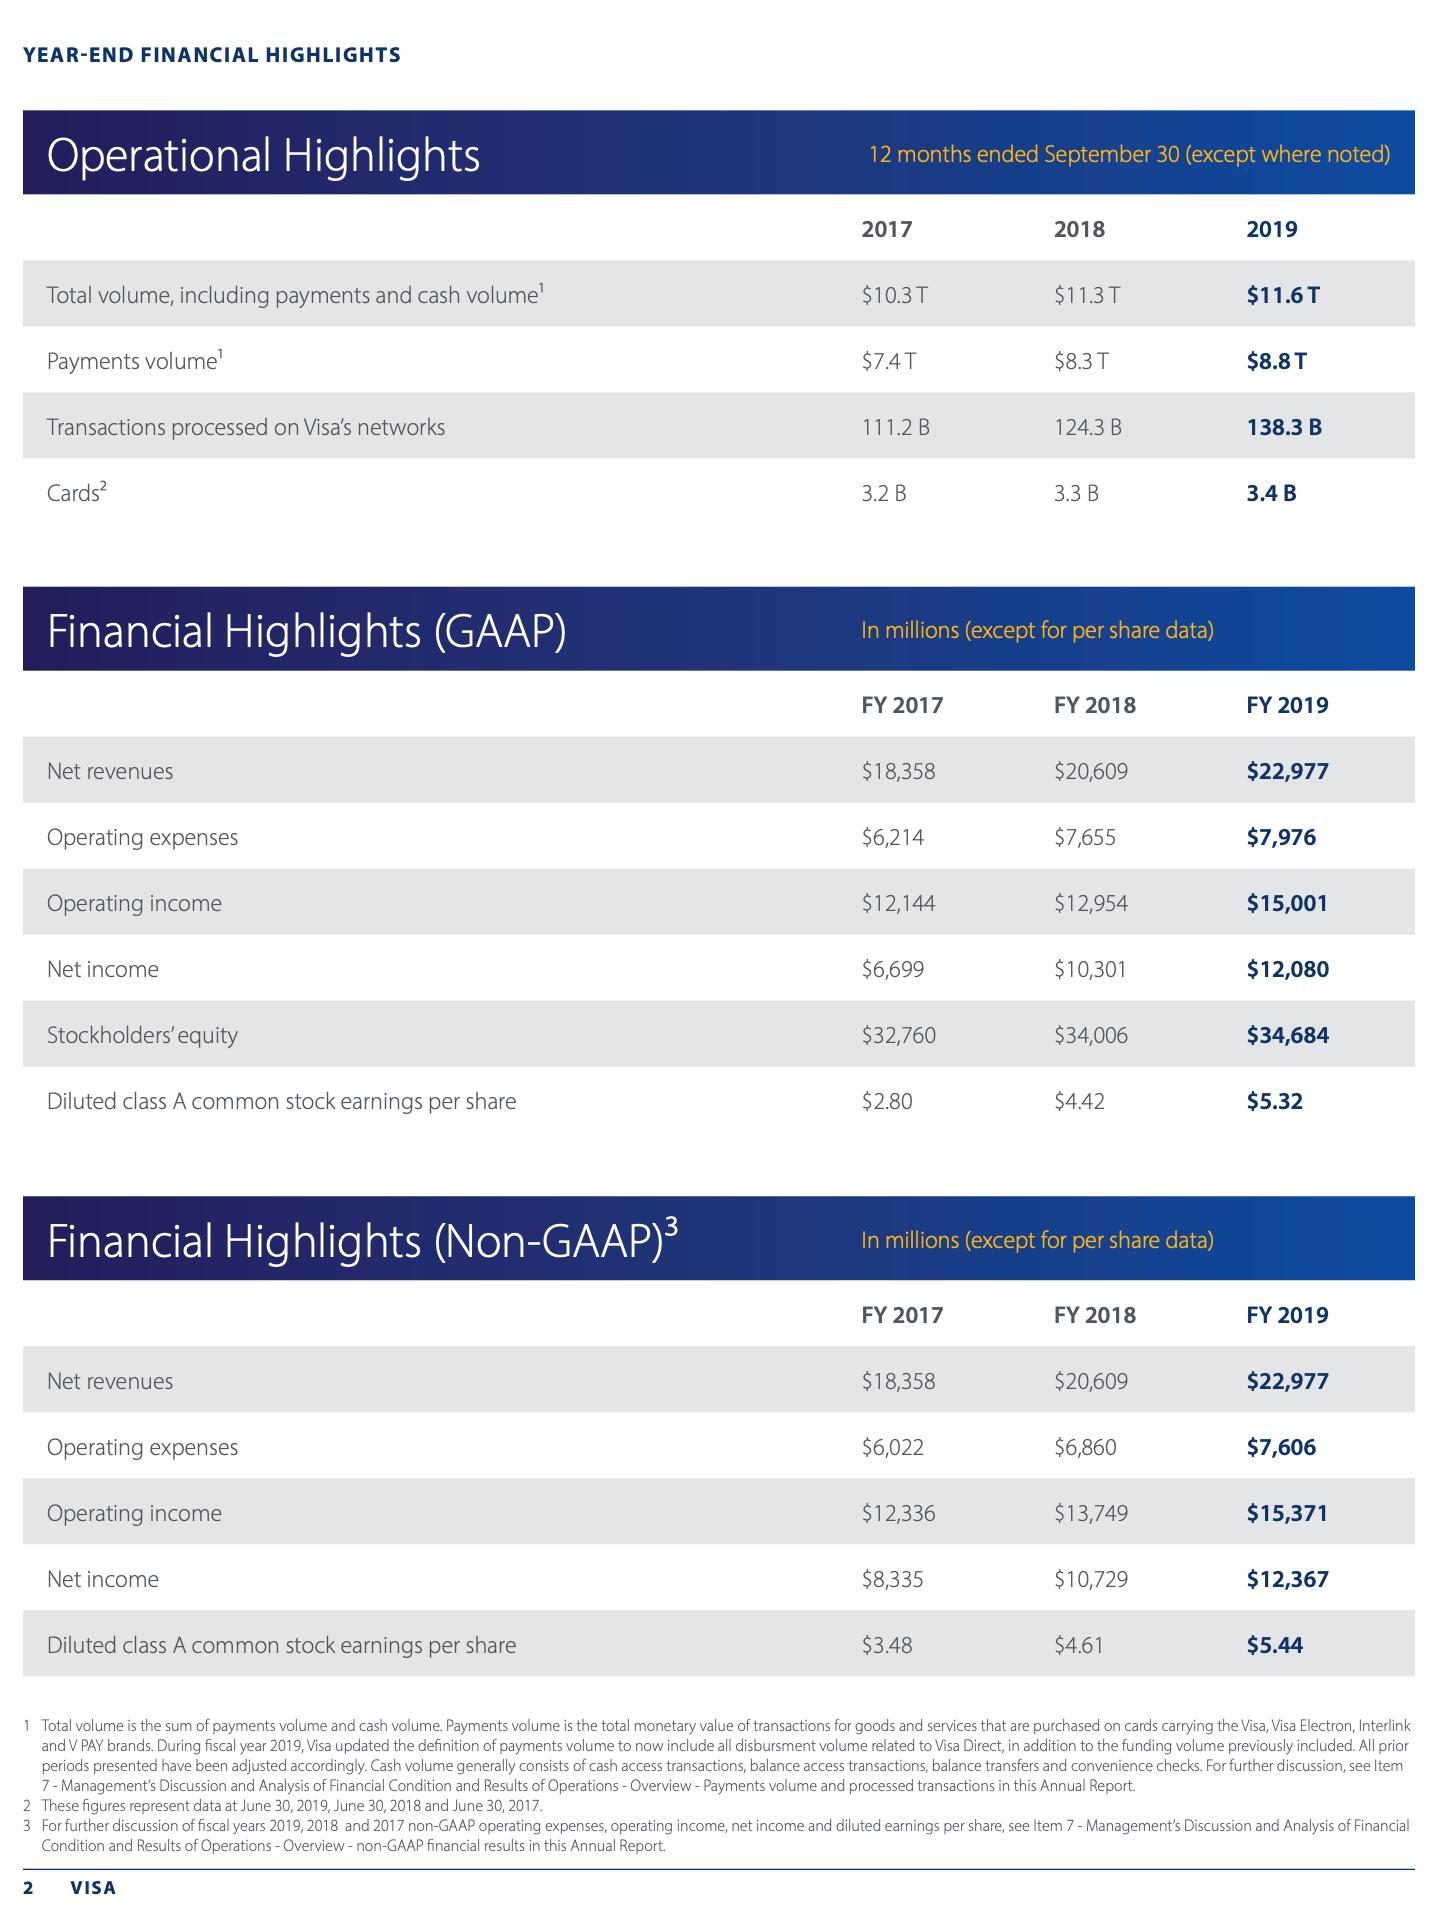 https://s24.q4cdn.com/307498497/files/doc_downloads/Visa_Inc_Fiscal_2019_Annual_Report.pdf